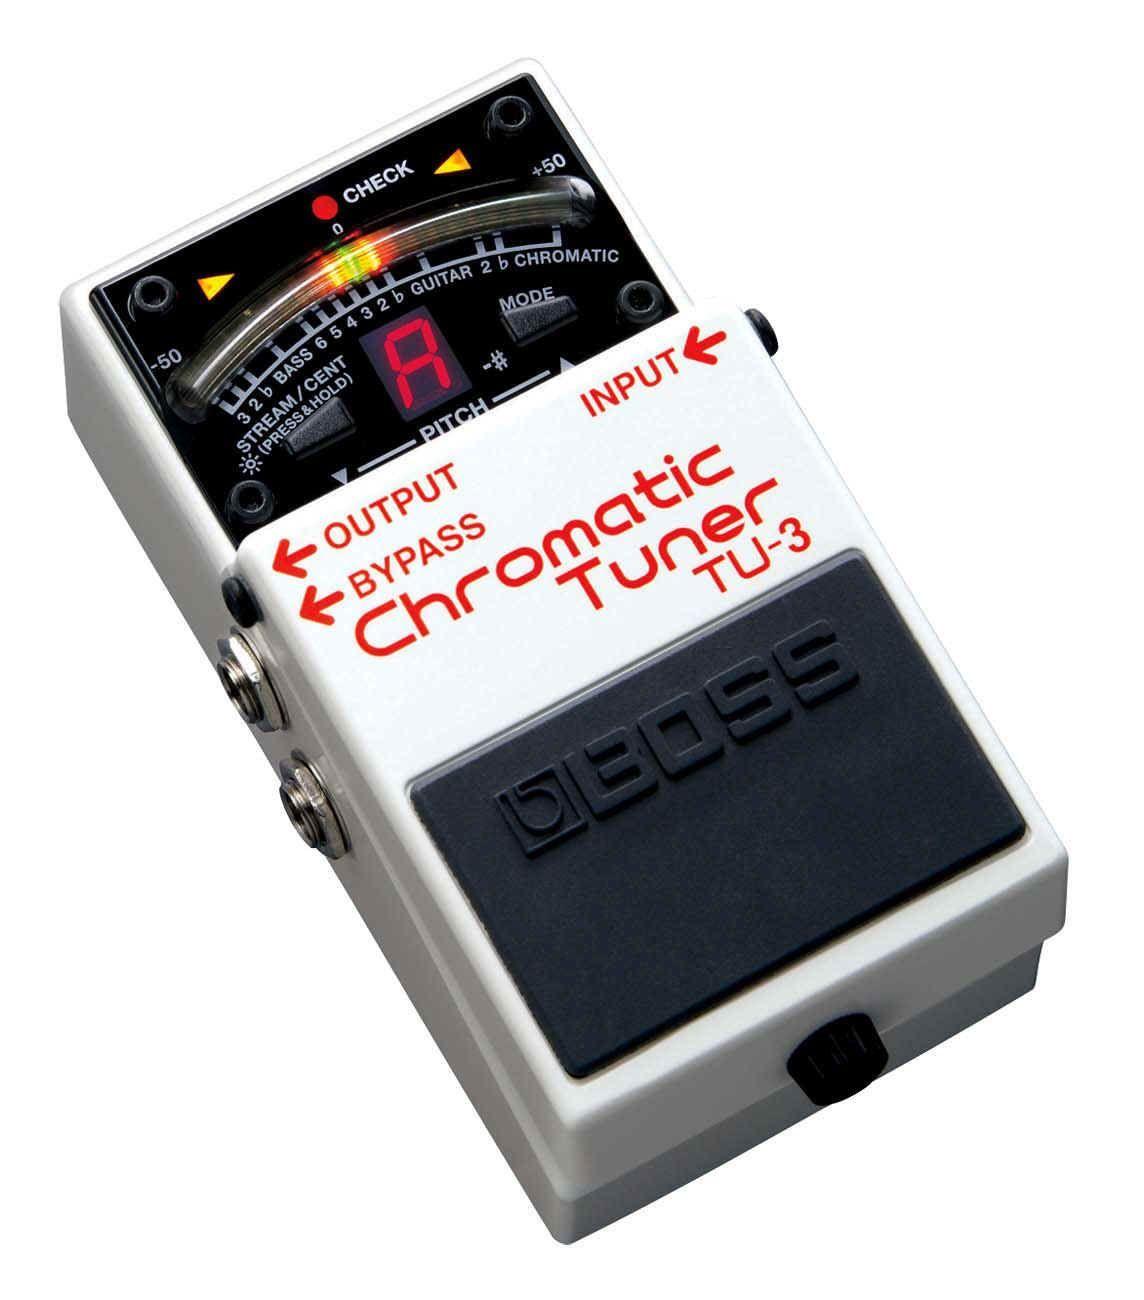 Boss TU-3 Chromatic Floor-Tuner, chromatisches Stimmgerät